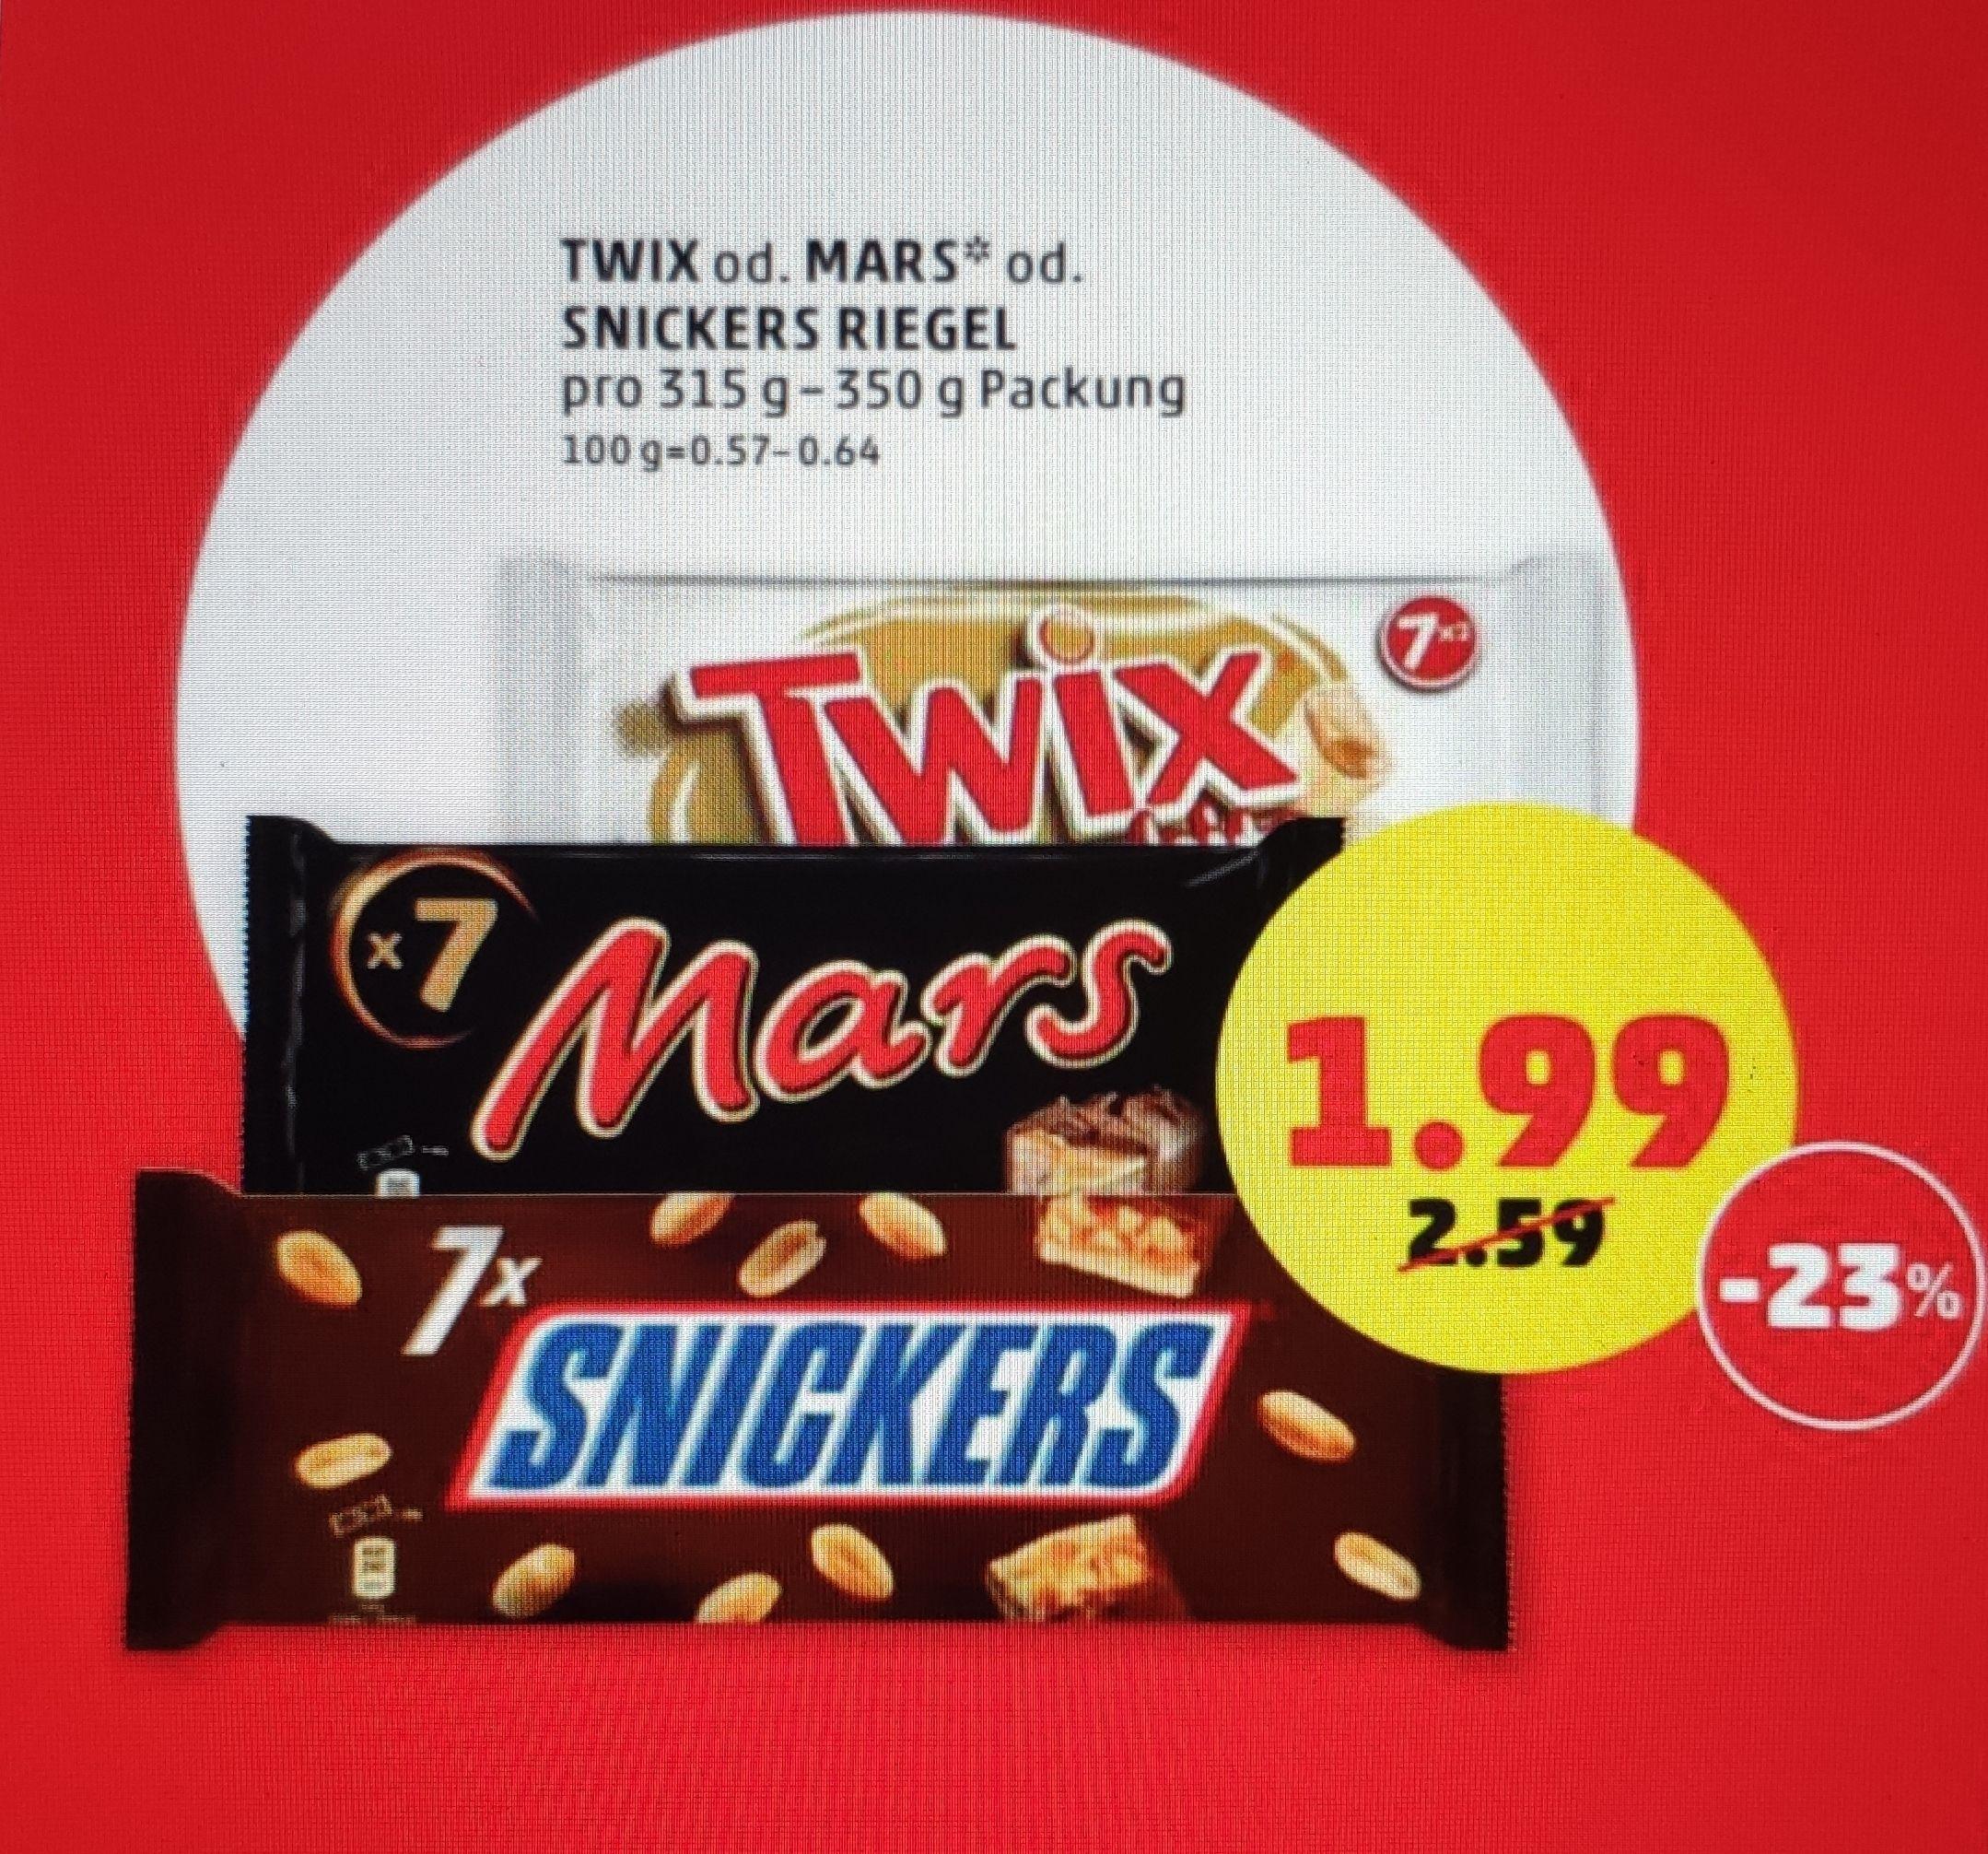 7er Snickers, Mars, Twix